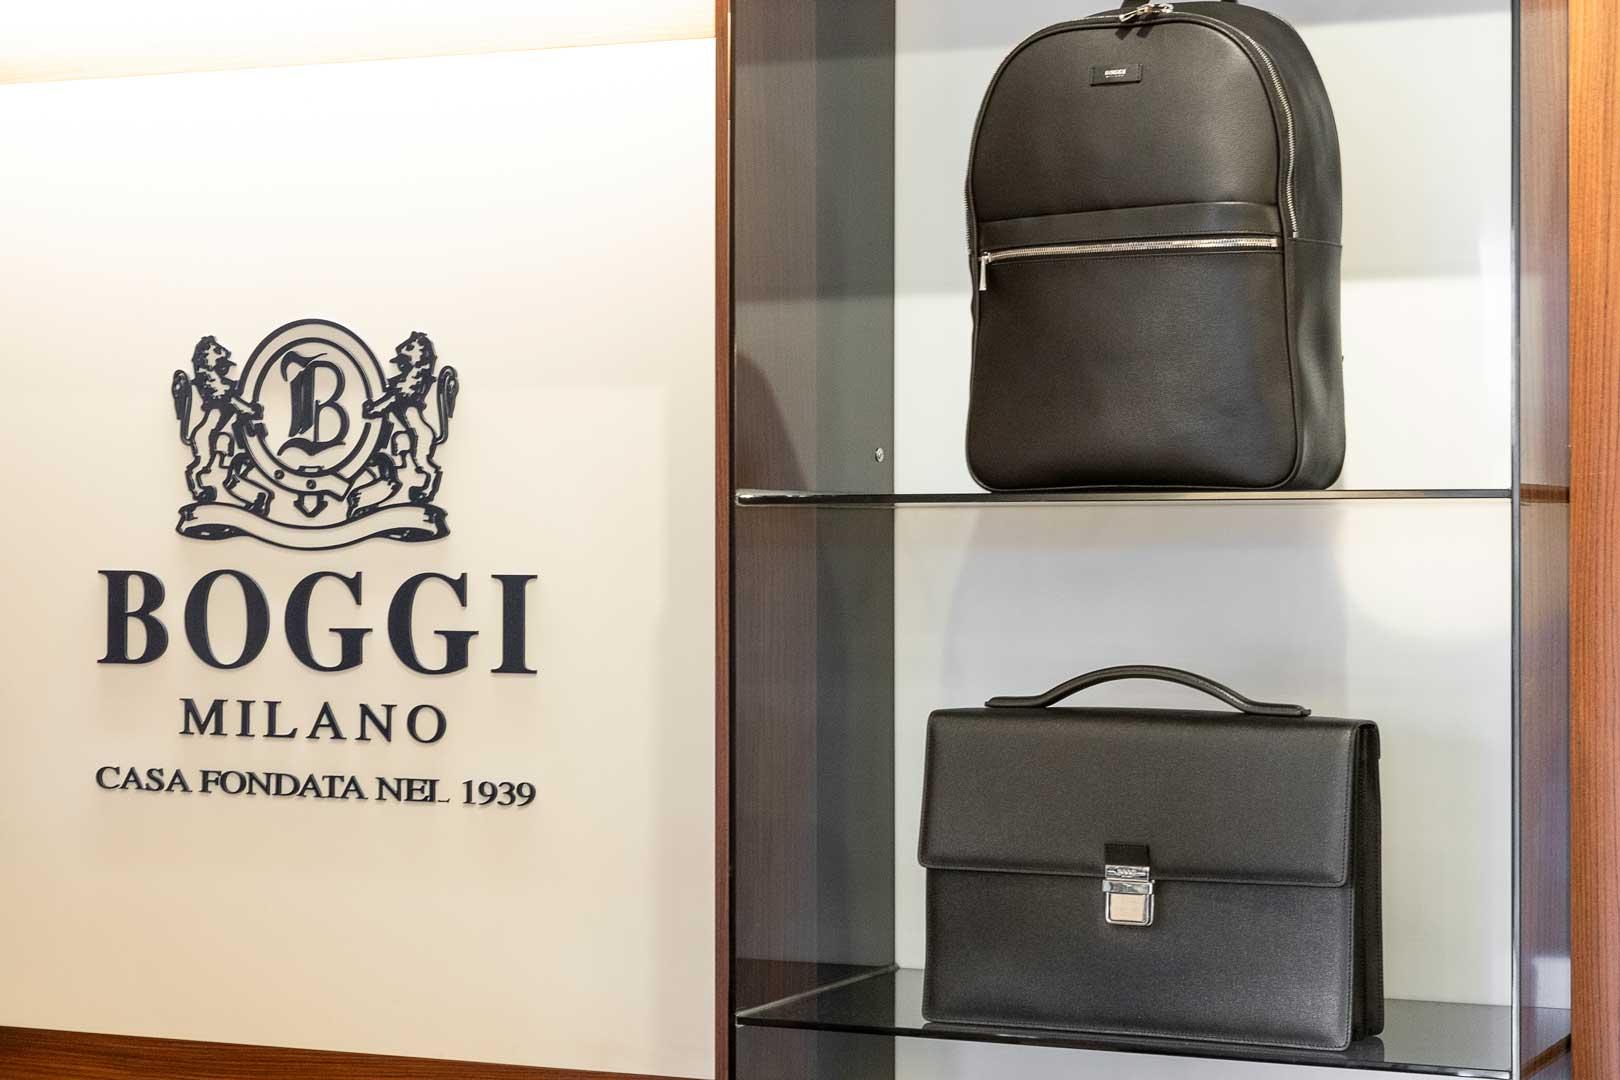 Boggi - Milano